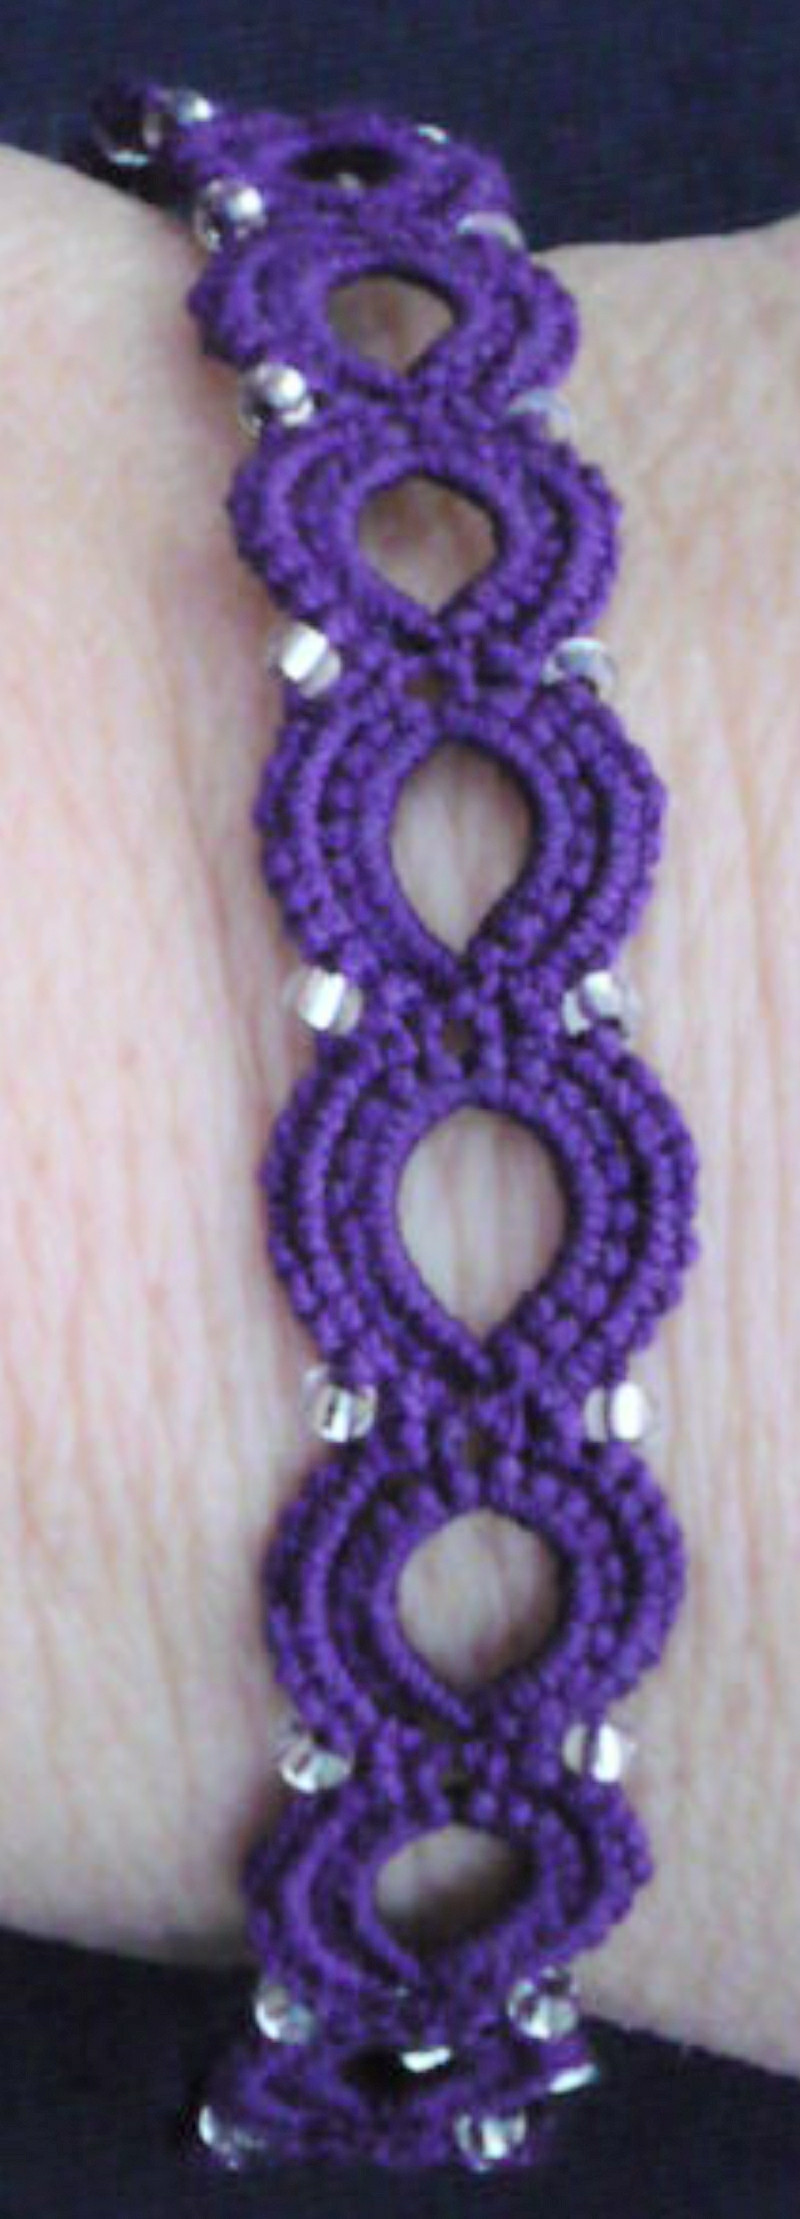 Bracelet with beads.jpg